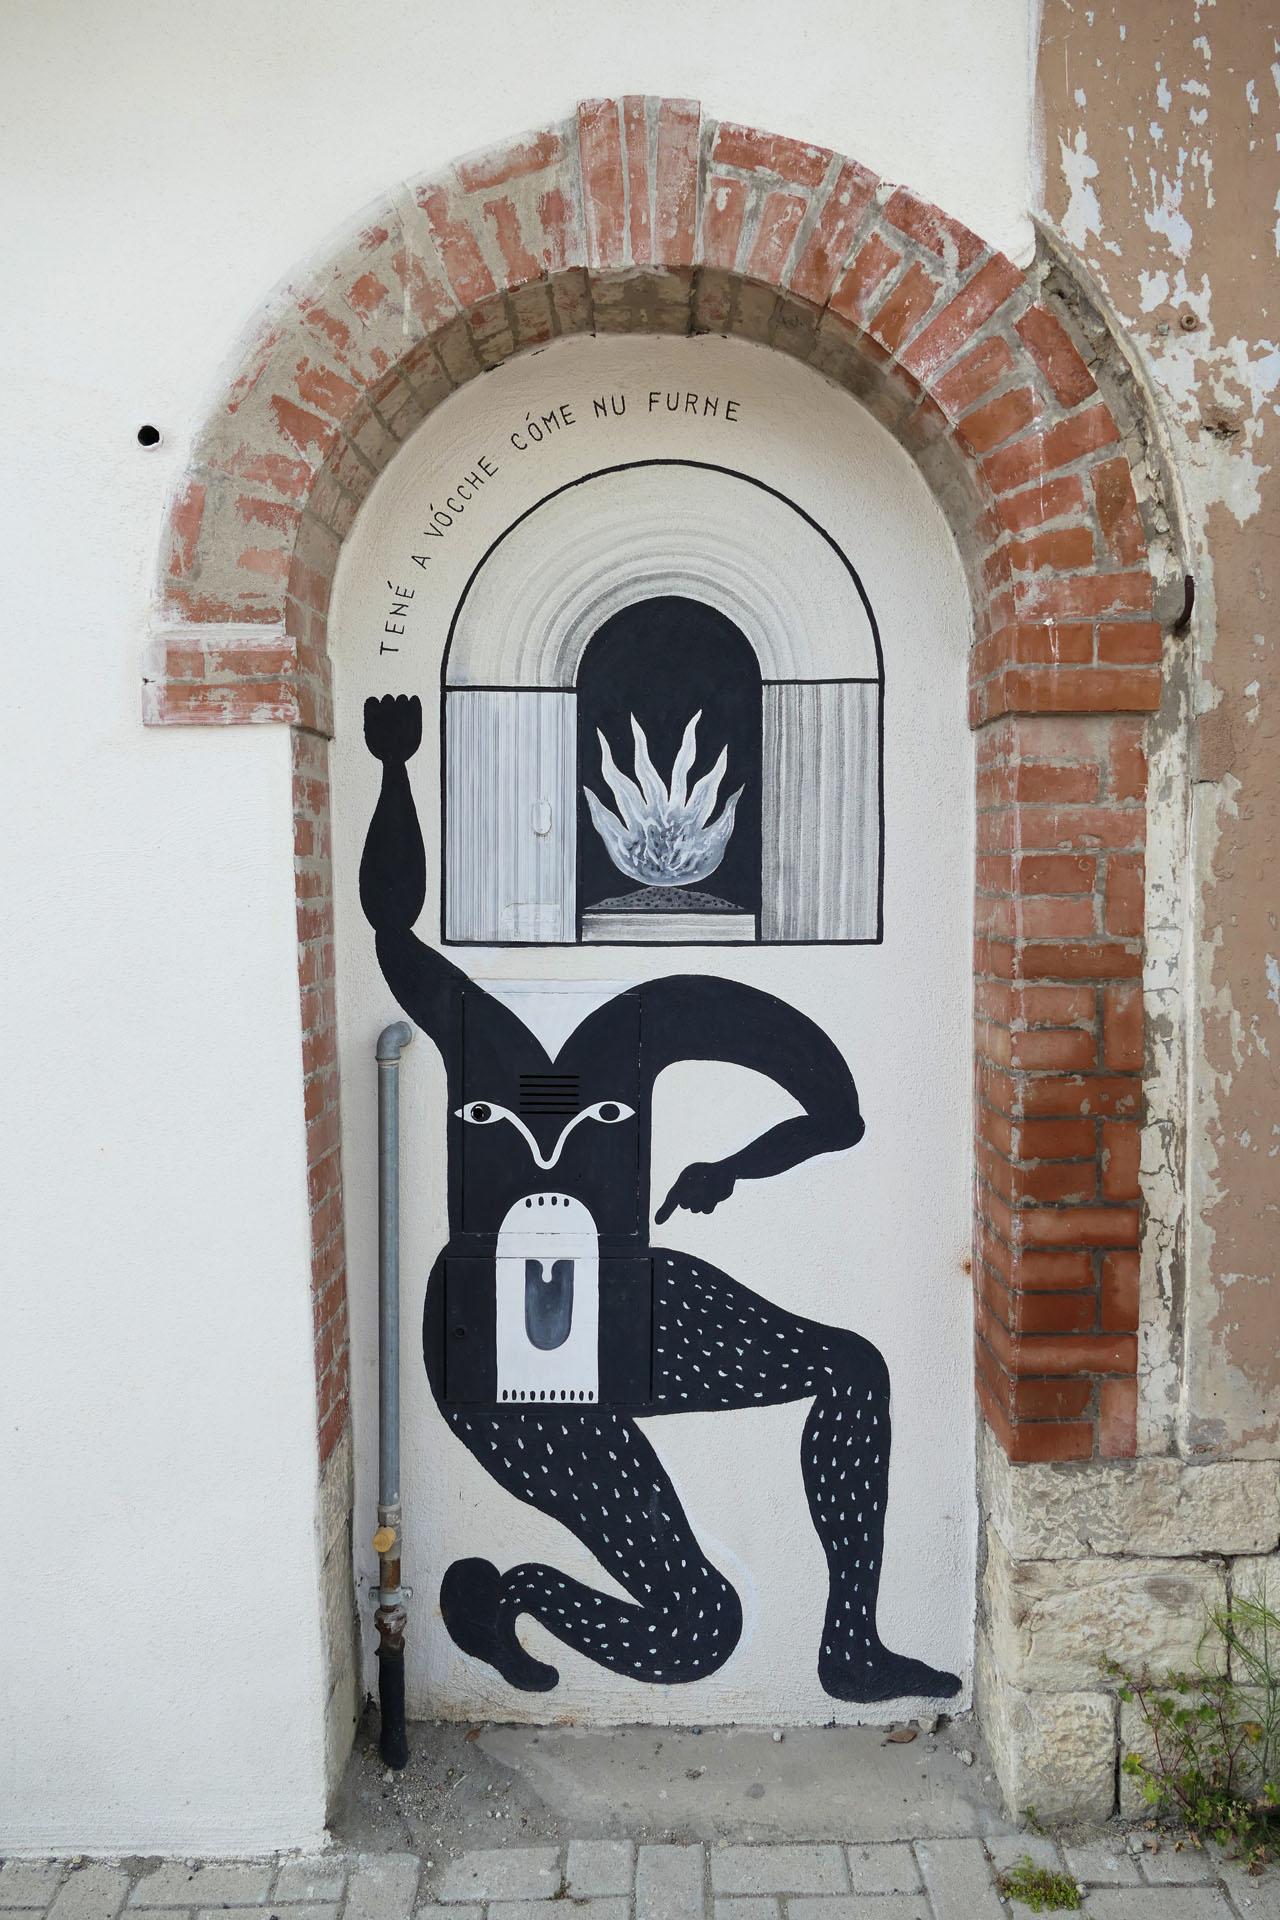 Street Art a Santa Croce di Magliano: I proverbi di Guerrilla Spam: Təné a vócchə cómə nu furnə